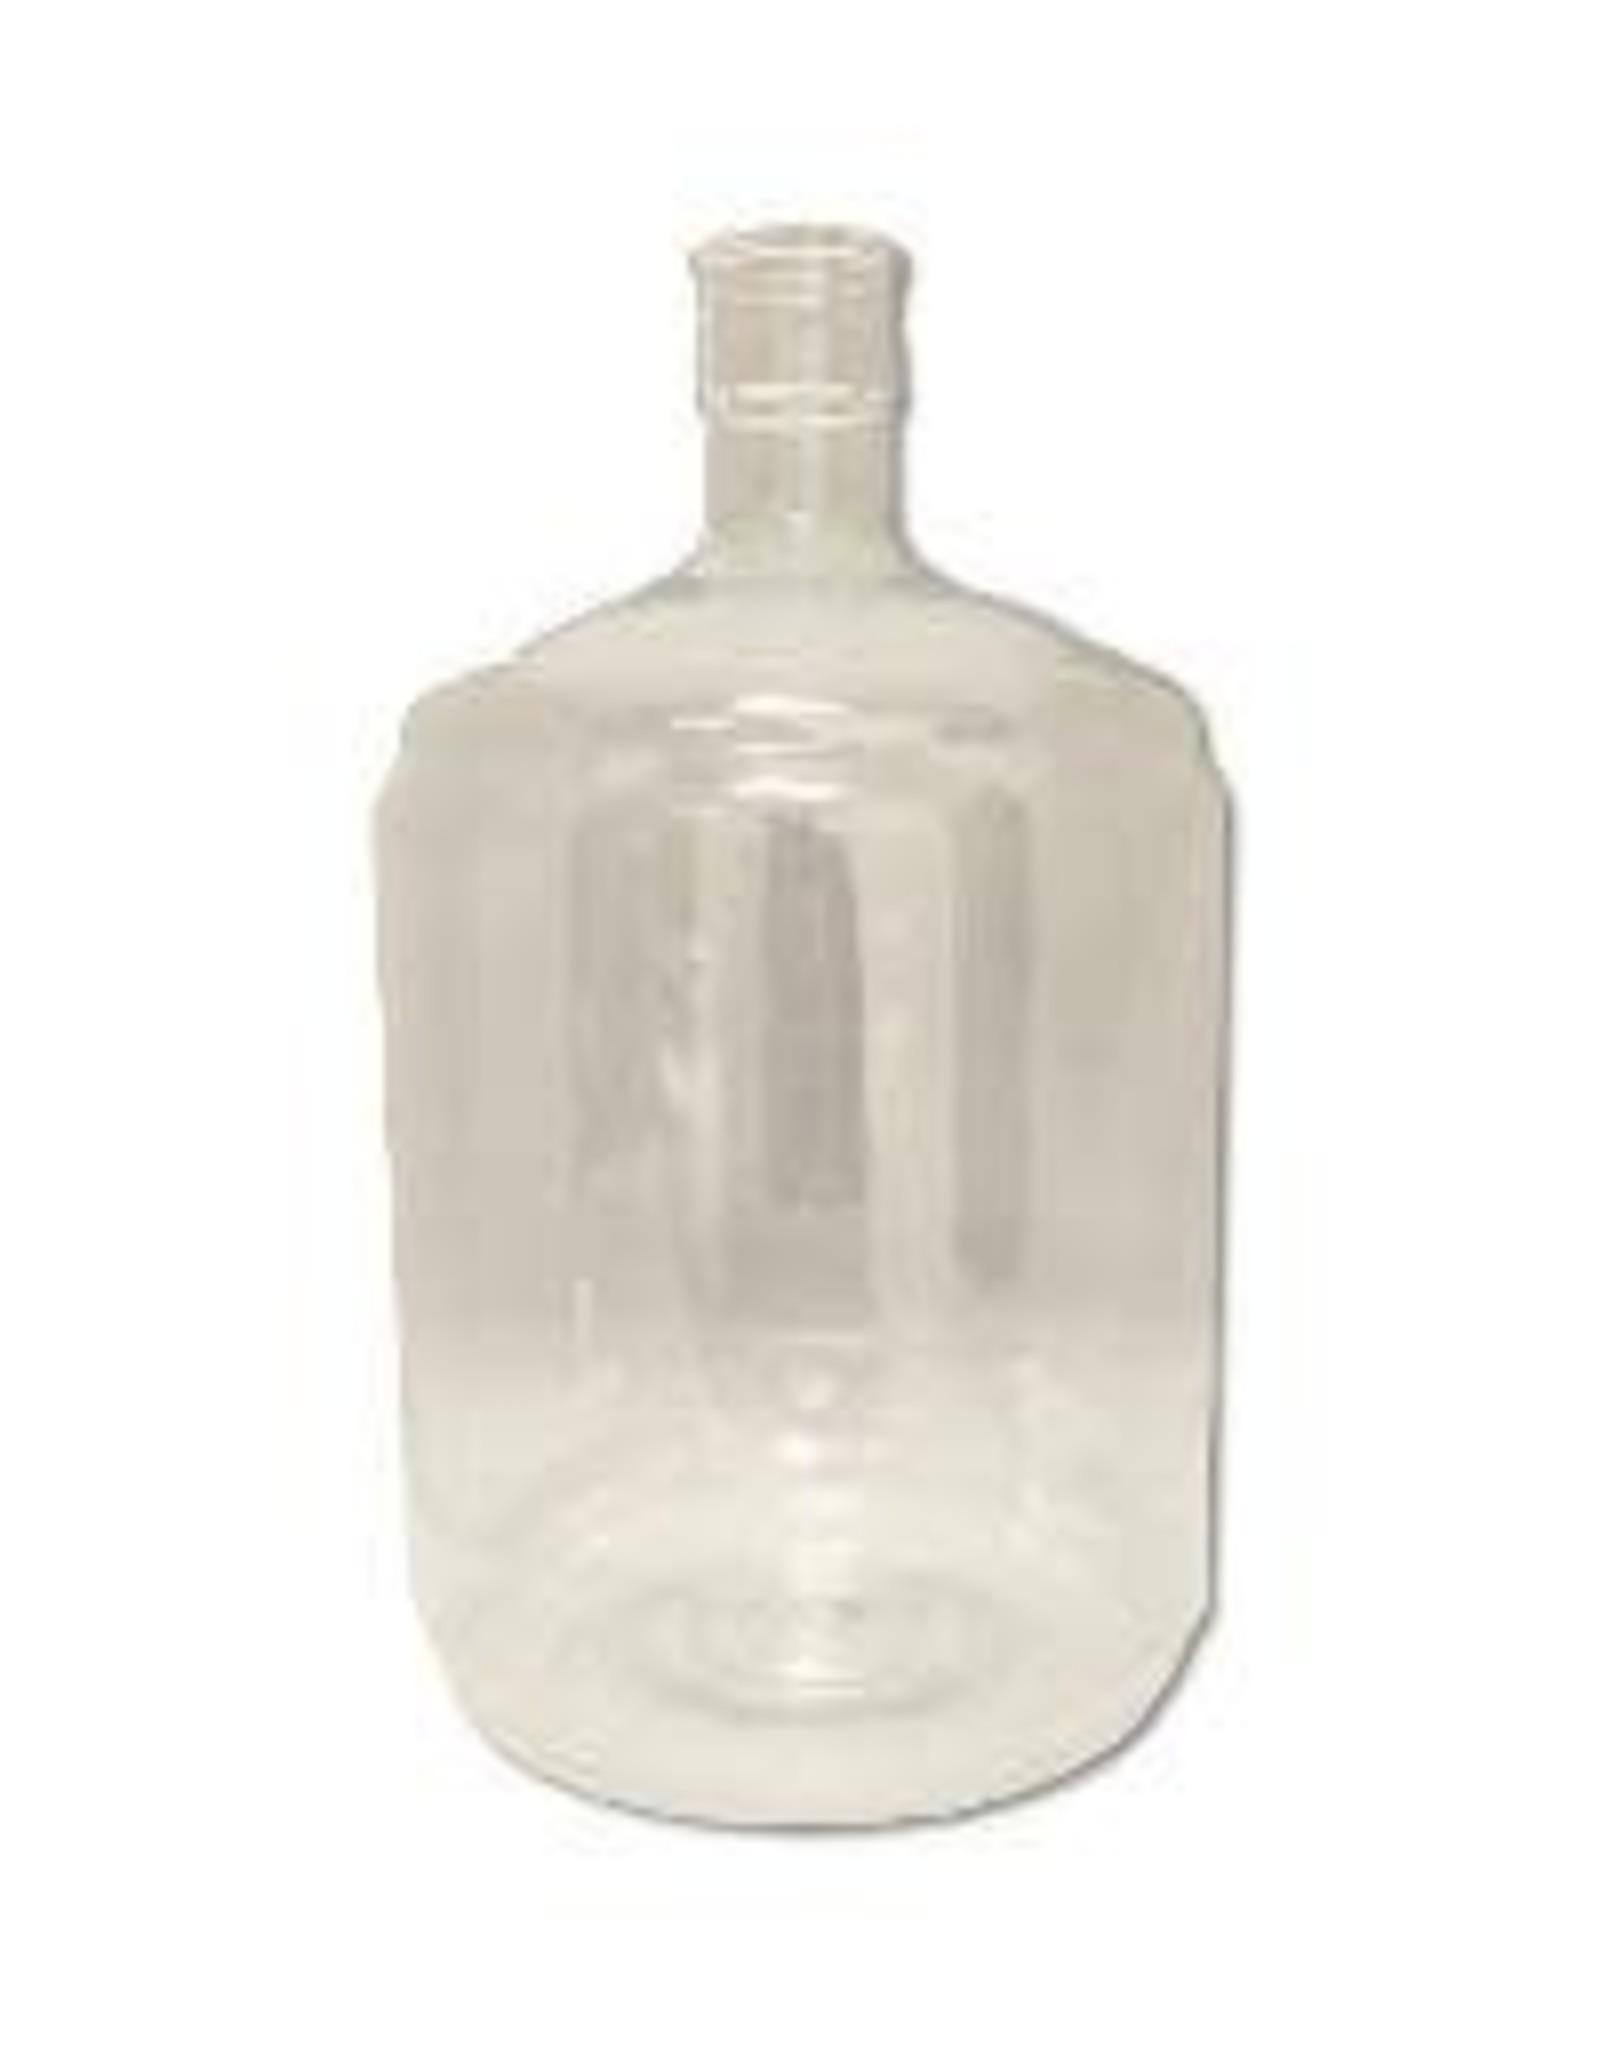 CARBOY- 3 GALLON PLASTIC